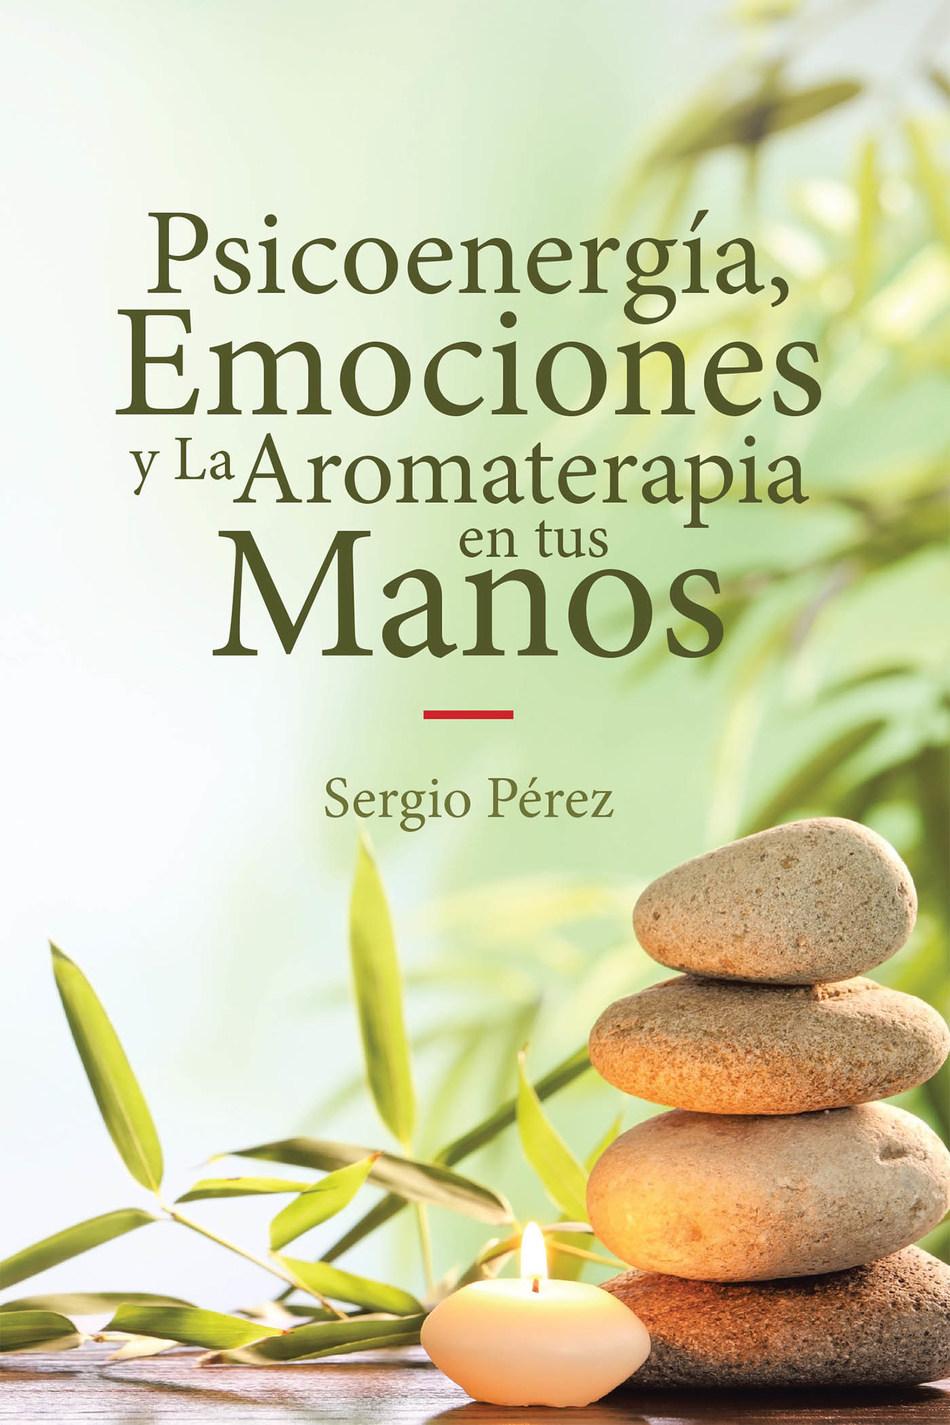 Sergio_Perez